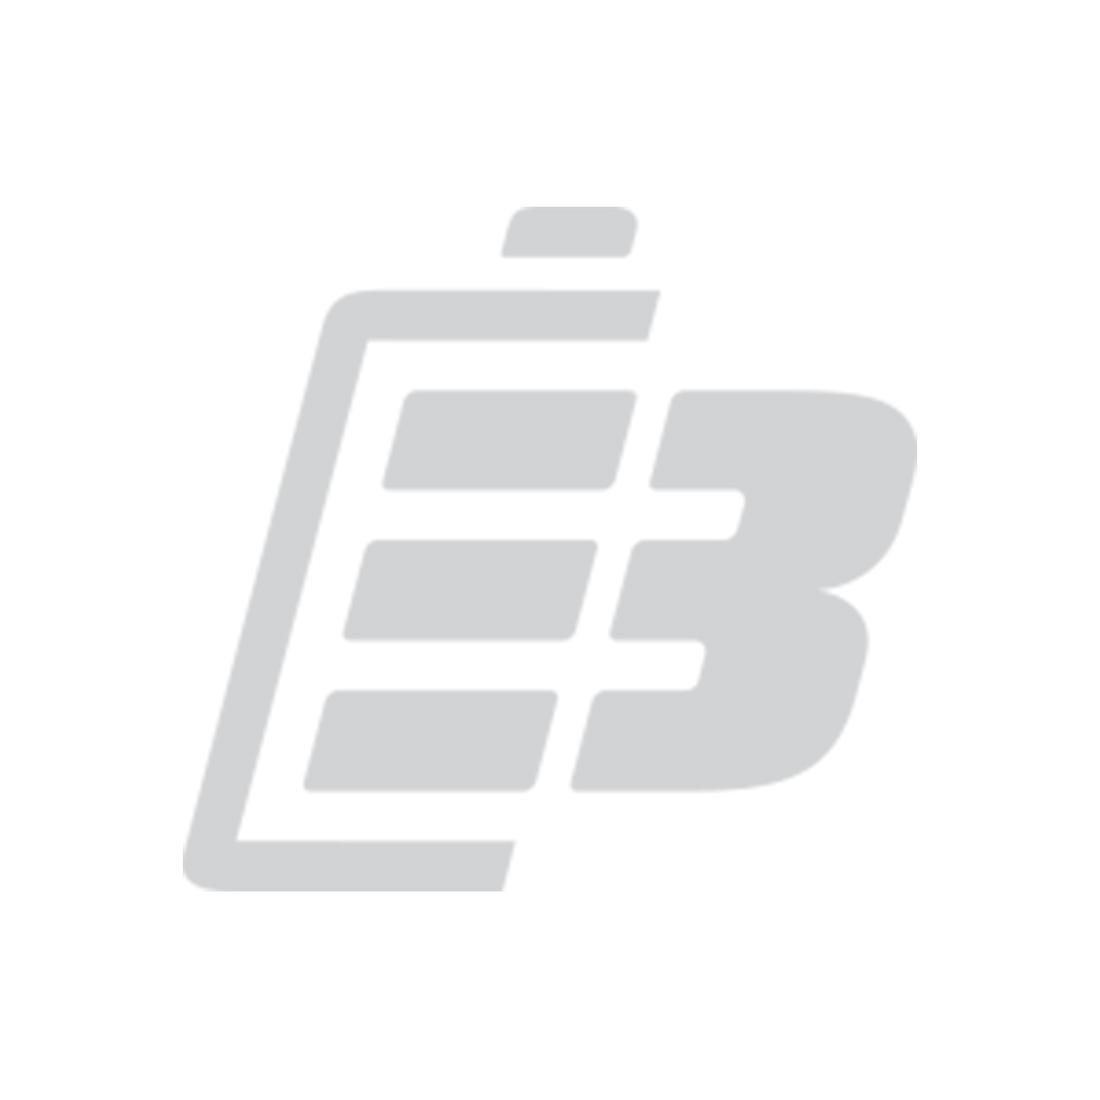 Fenix HM50R Multipurpose LED Headlamp